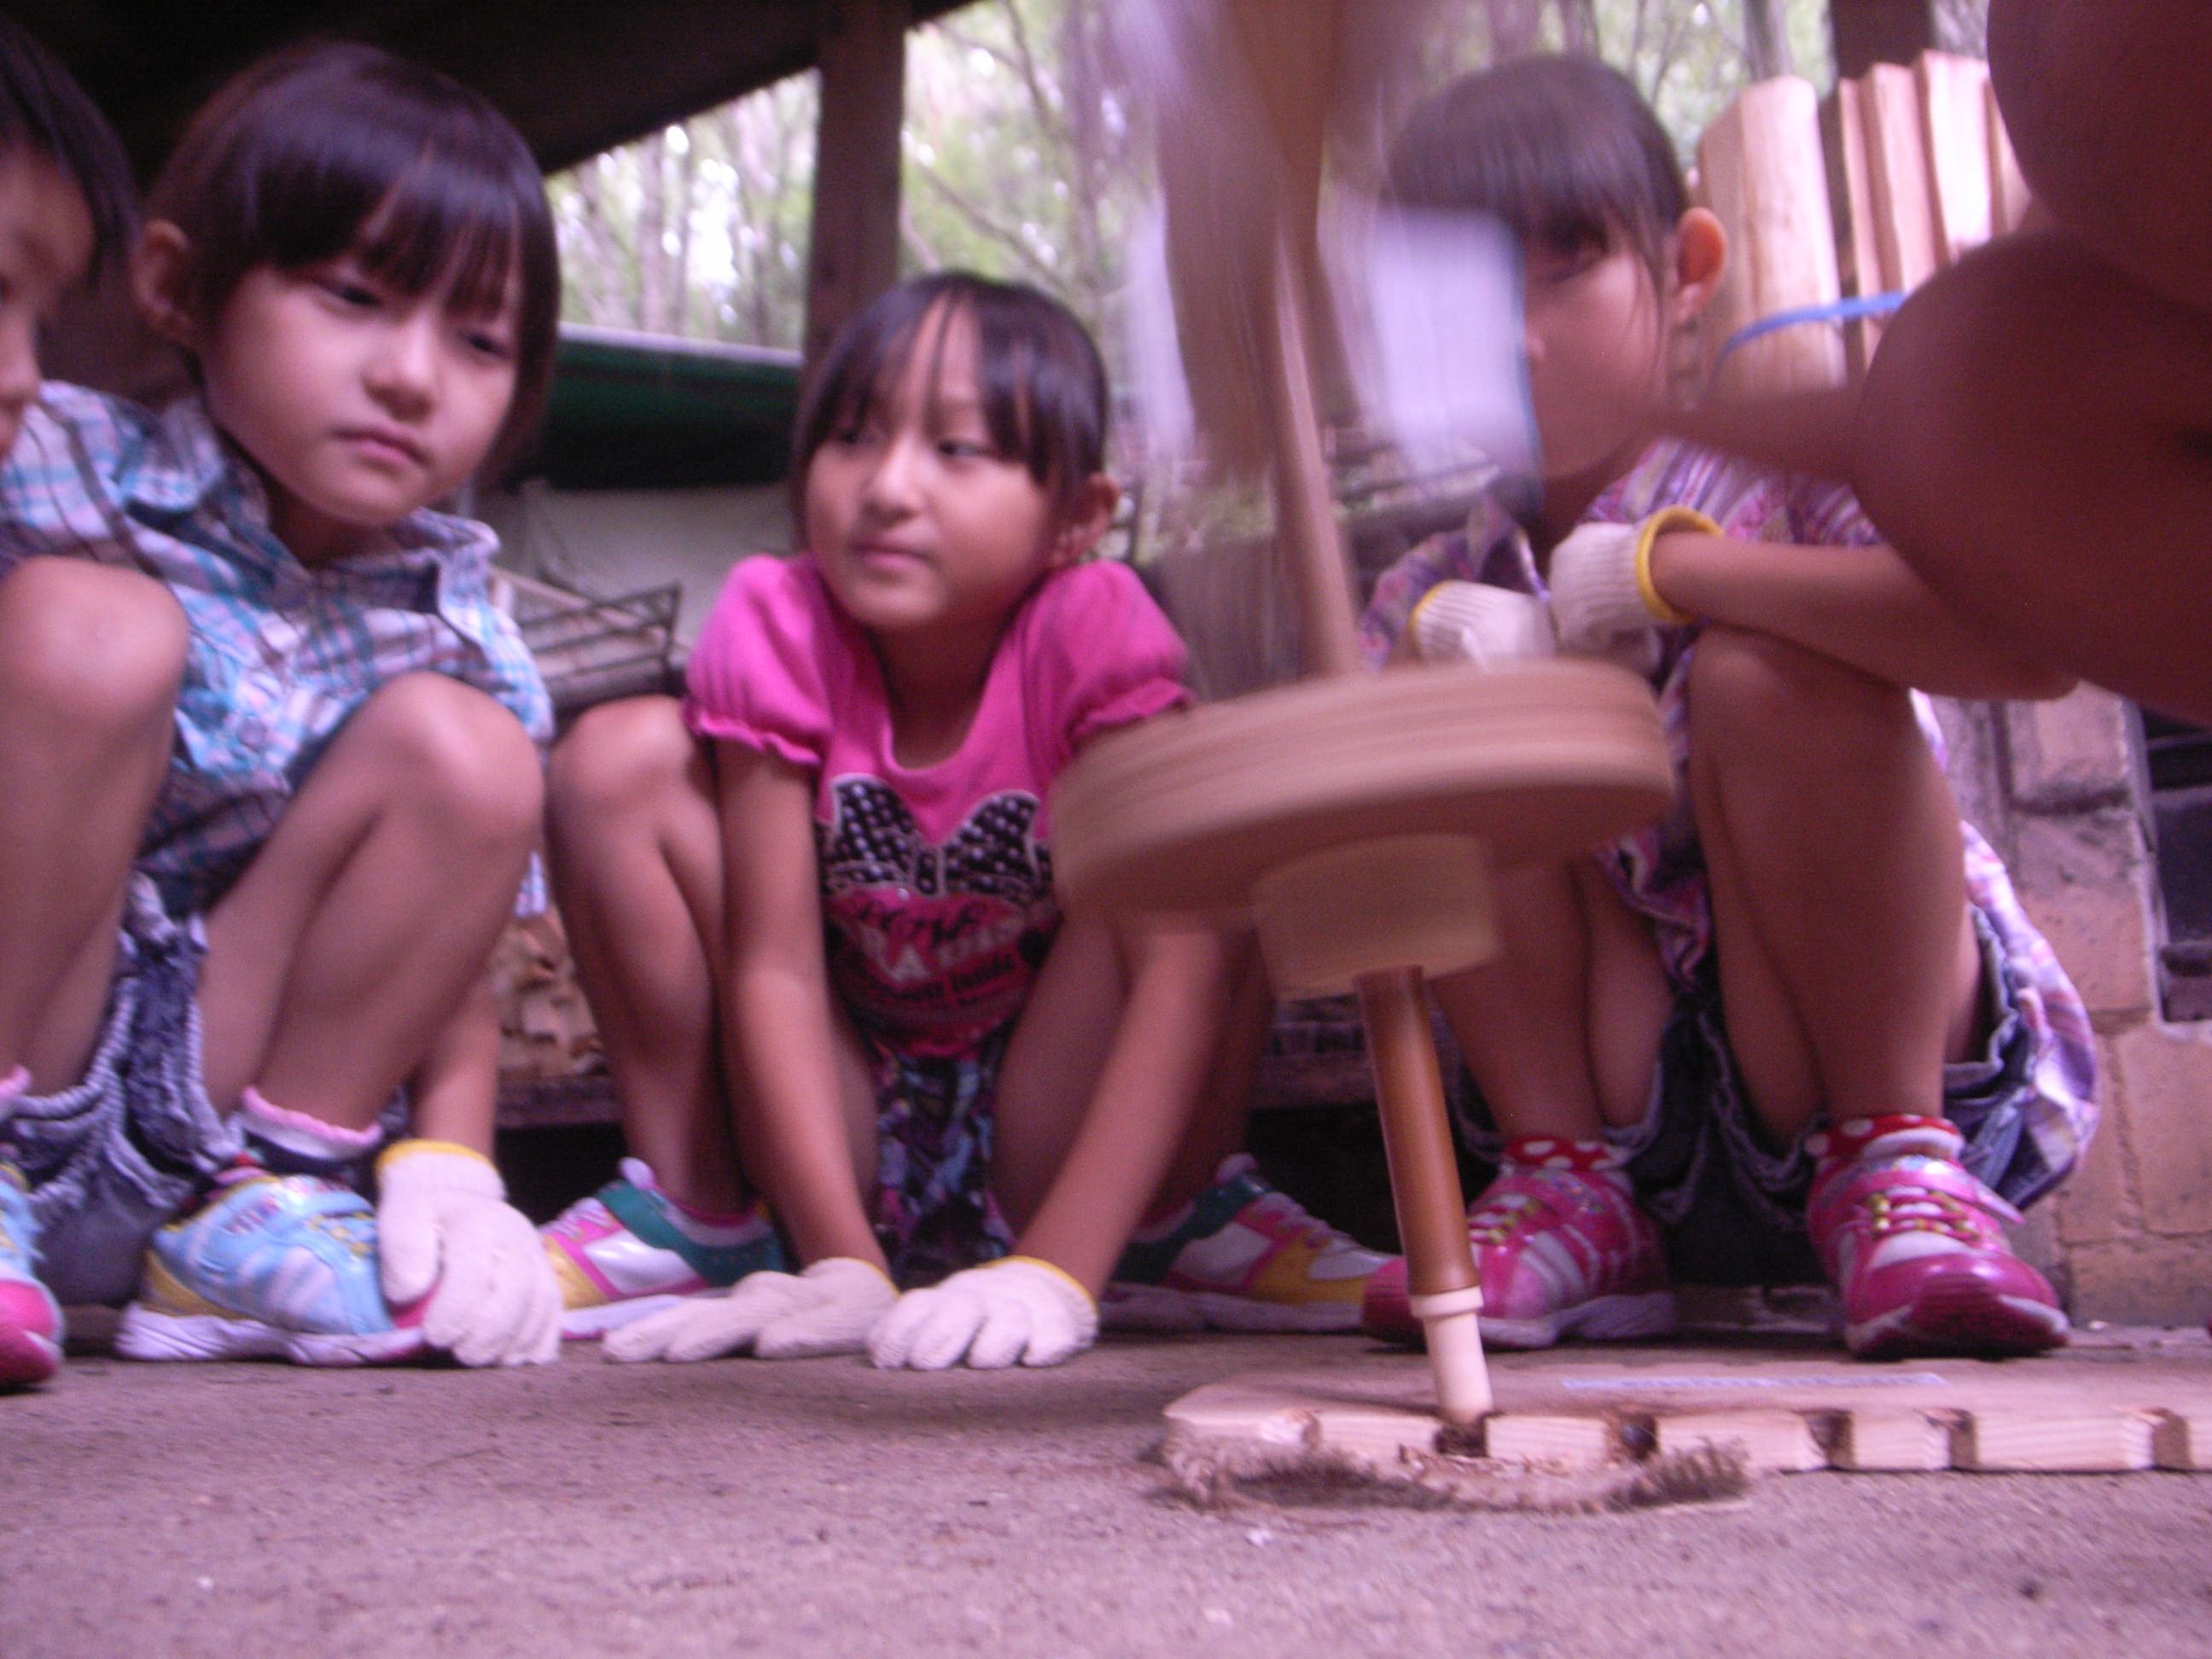 【JS】女子小学生 高学年画像スレPart30【JS】 [転載禁止]©bbspink.comYouTube動画>5本 ->画像>368枚